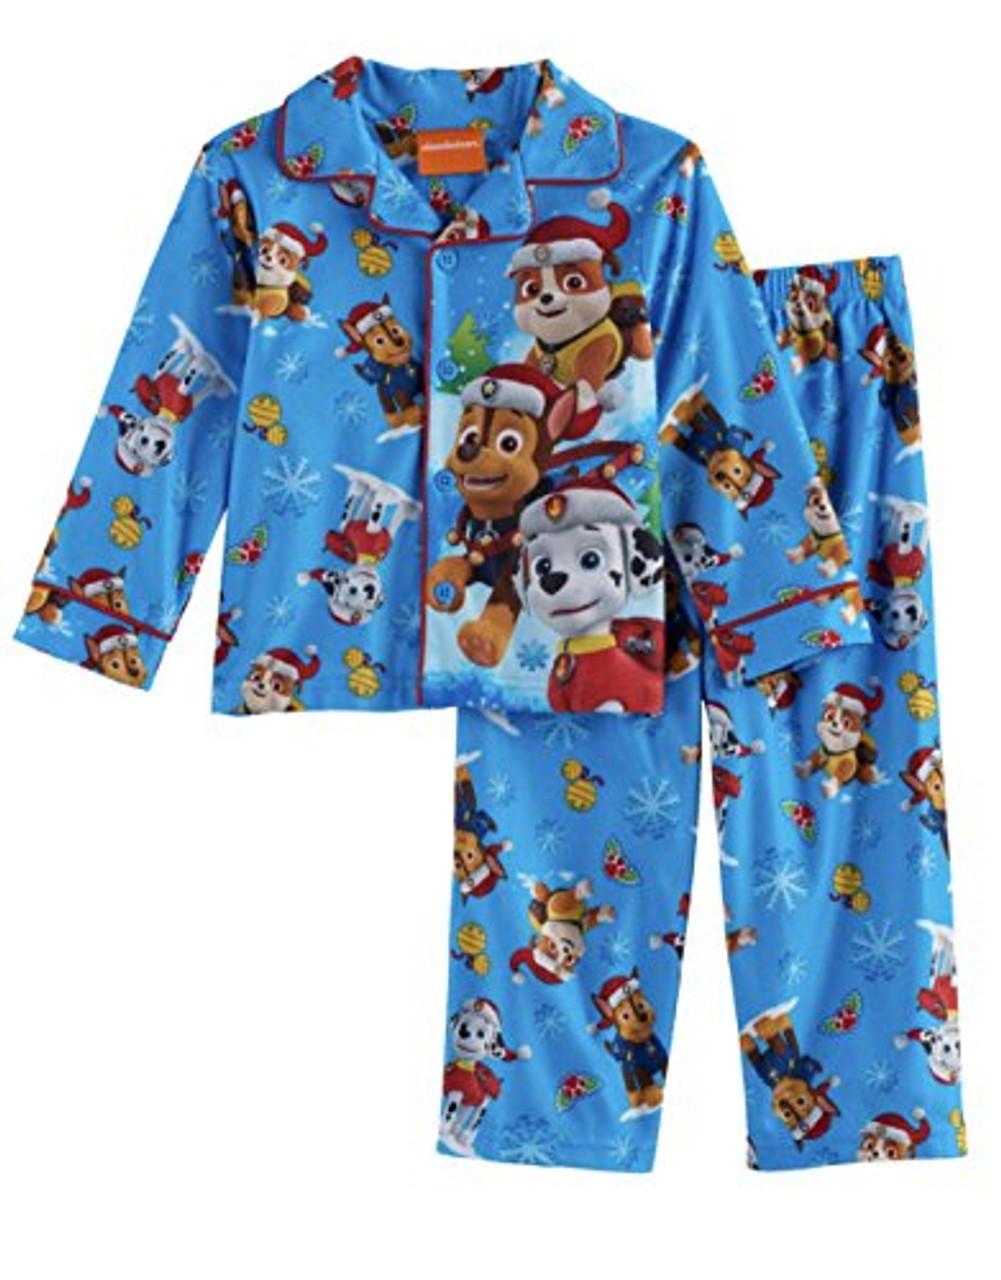 Paw Patrol Boys 2T Chase Marshall and Rubble Christmas Flannel Pajama Set